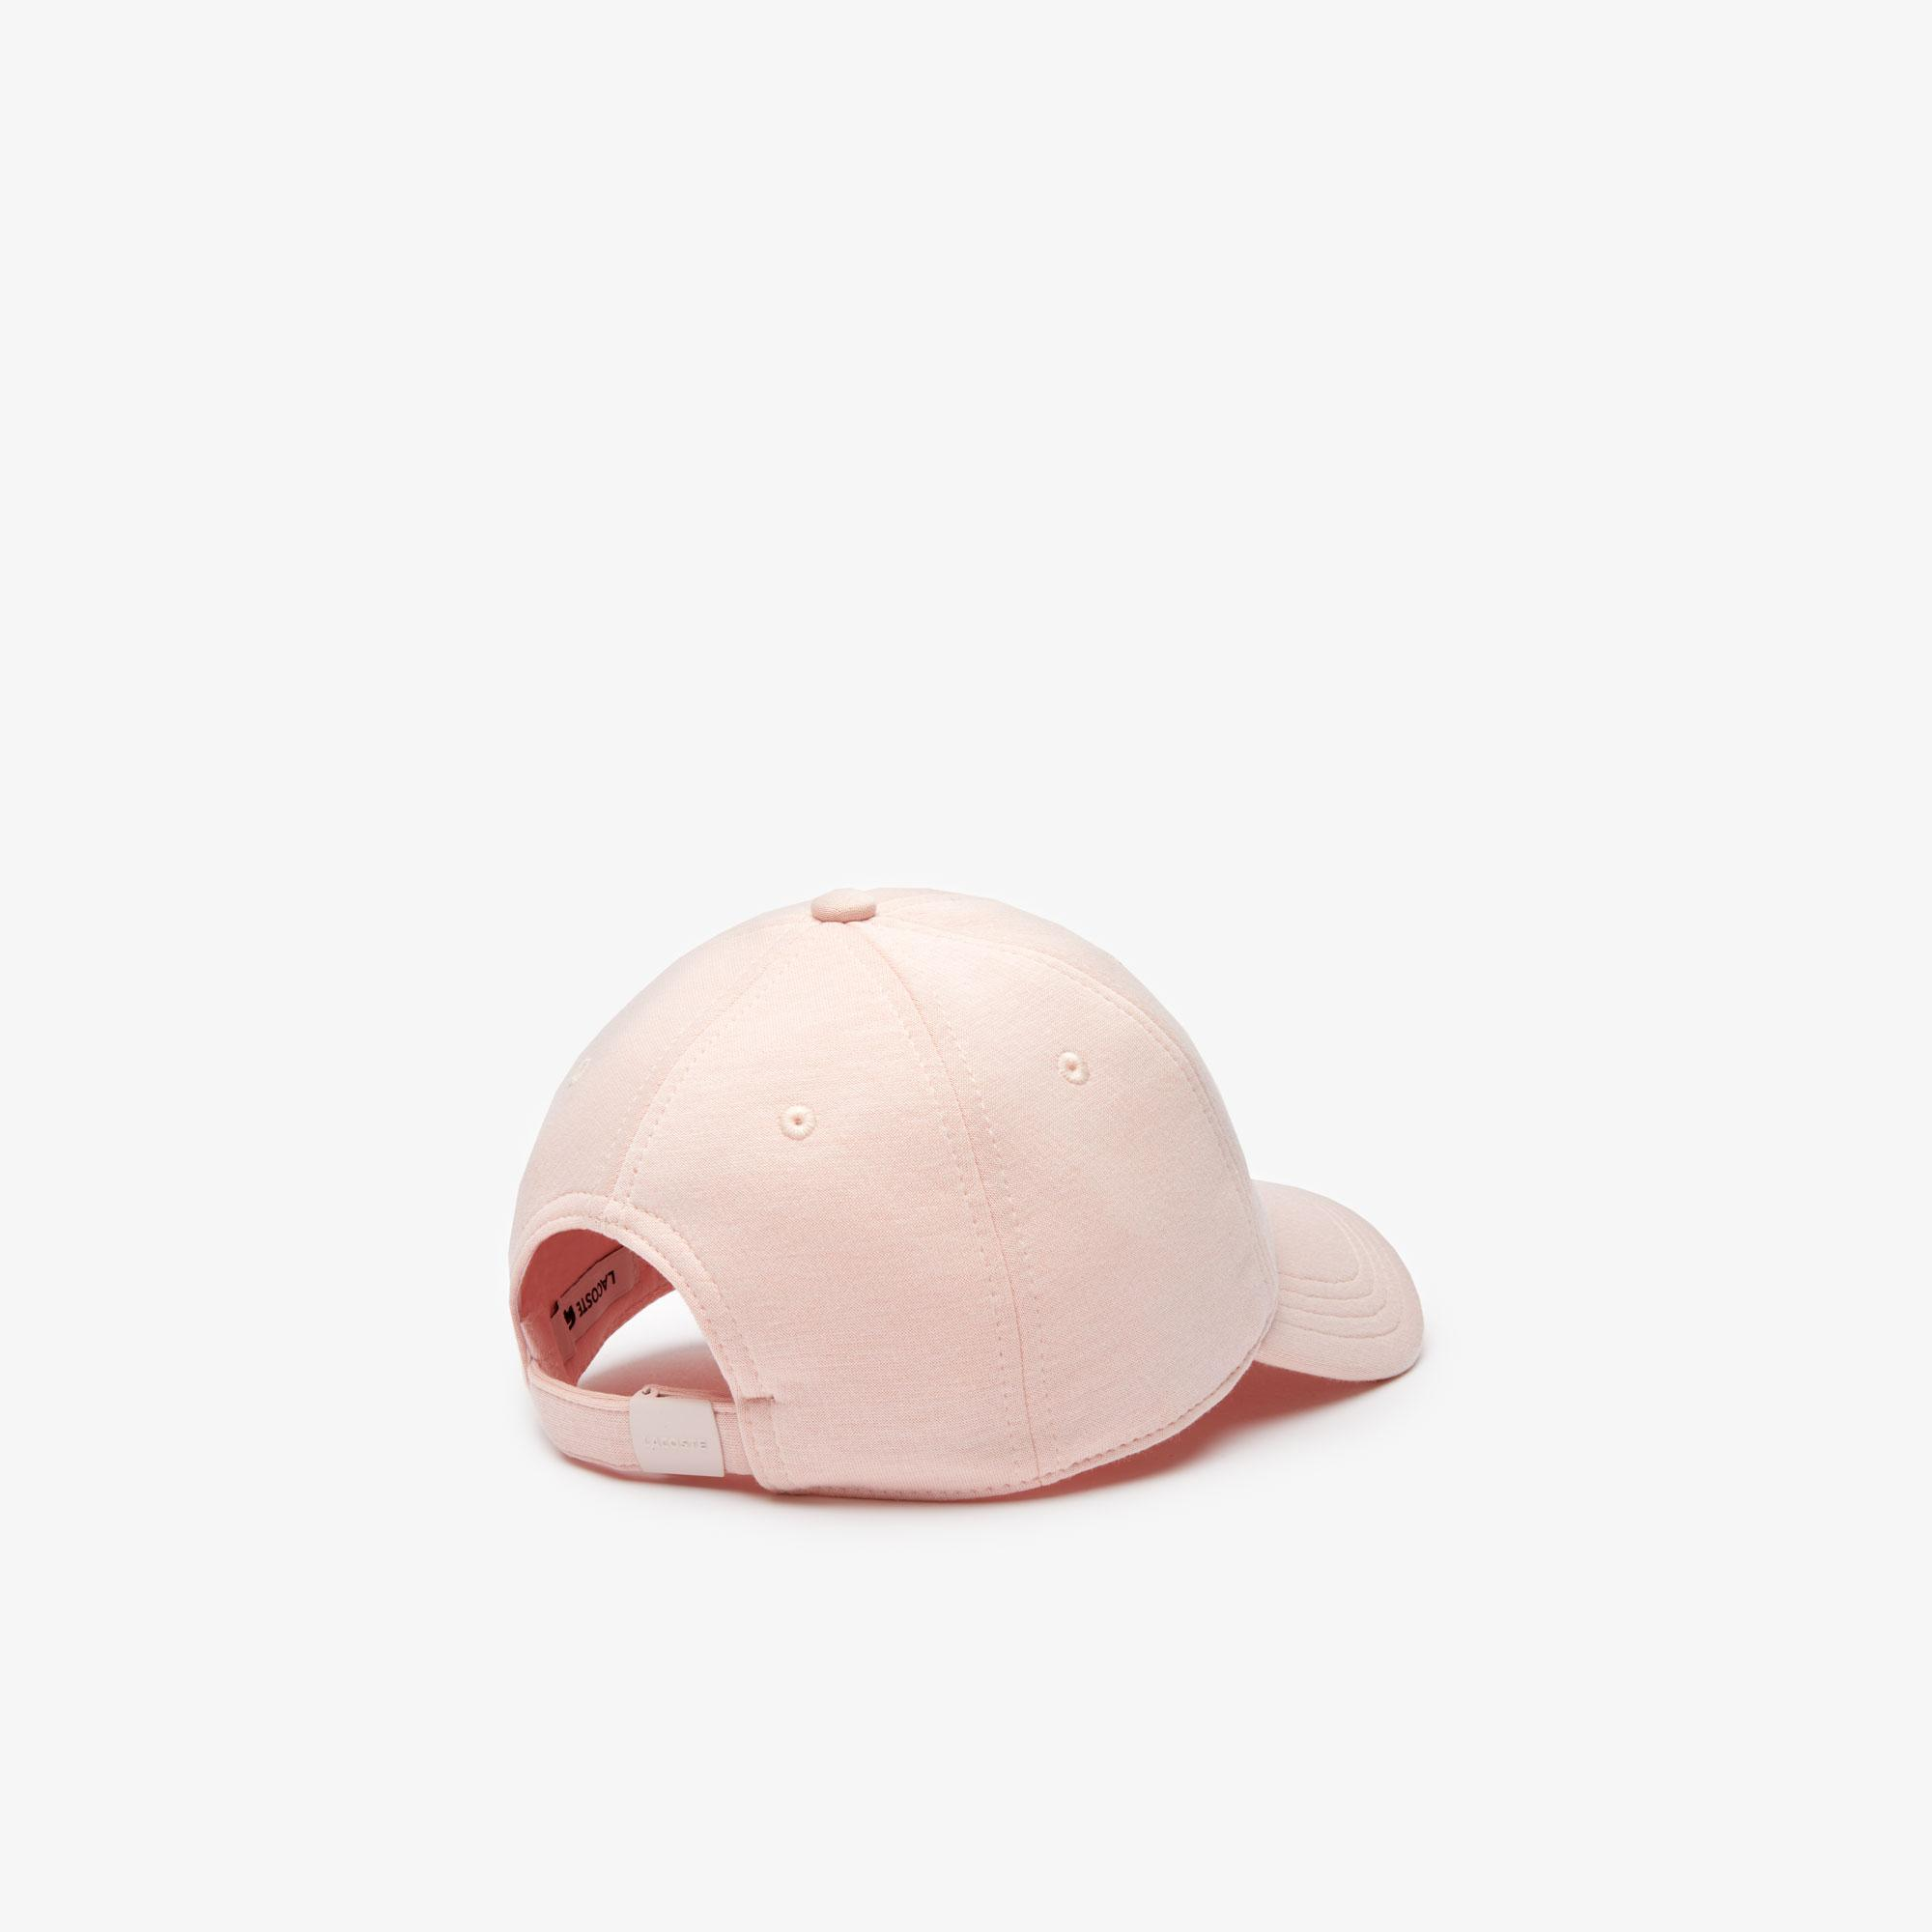 Lacoste Unisex Desenli Açık Pembe Şapka